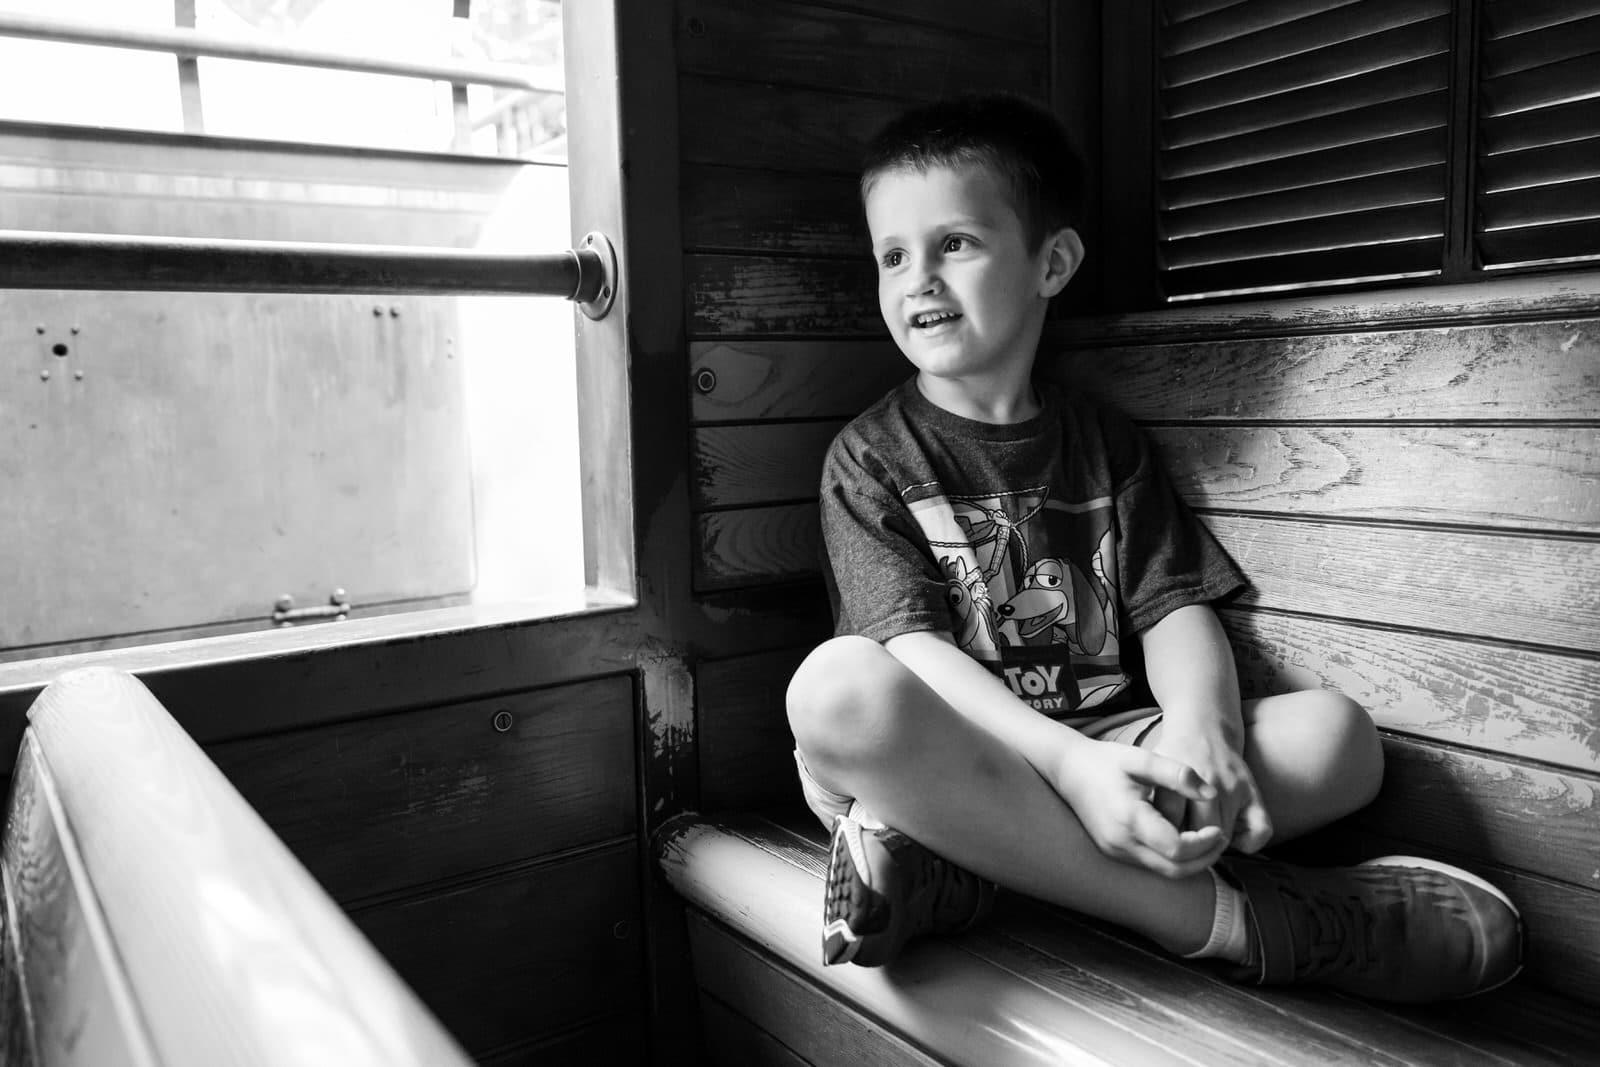 boy rides train at Animal Kingdom